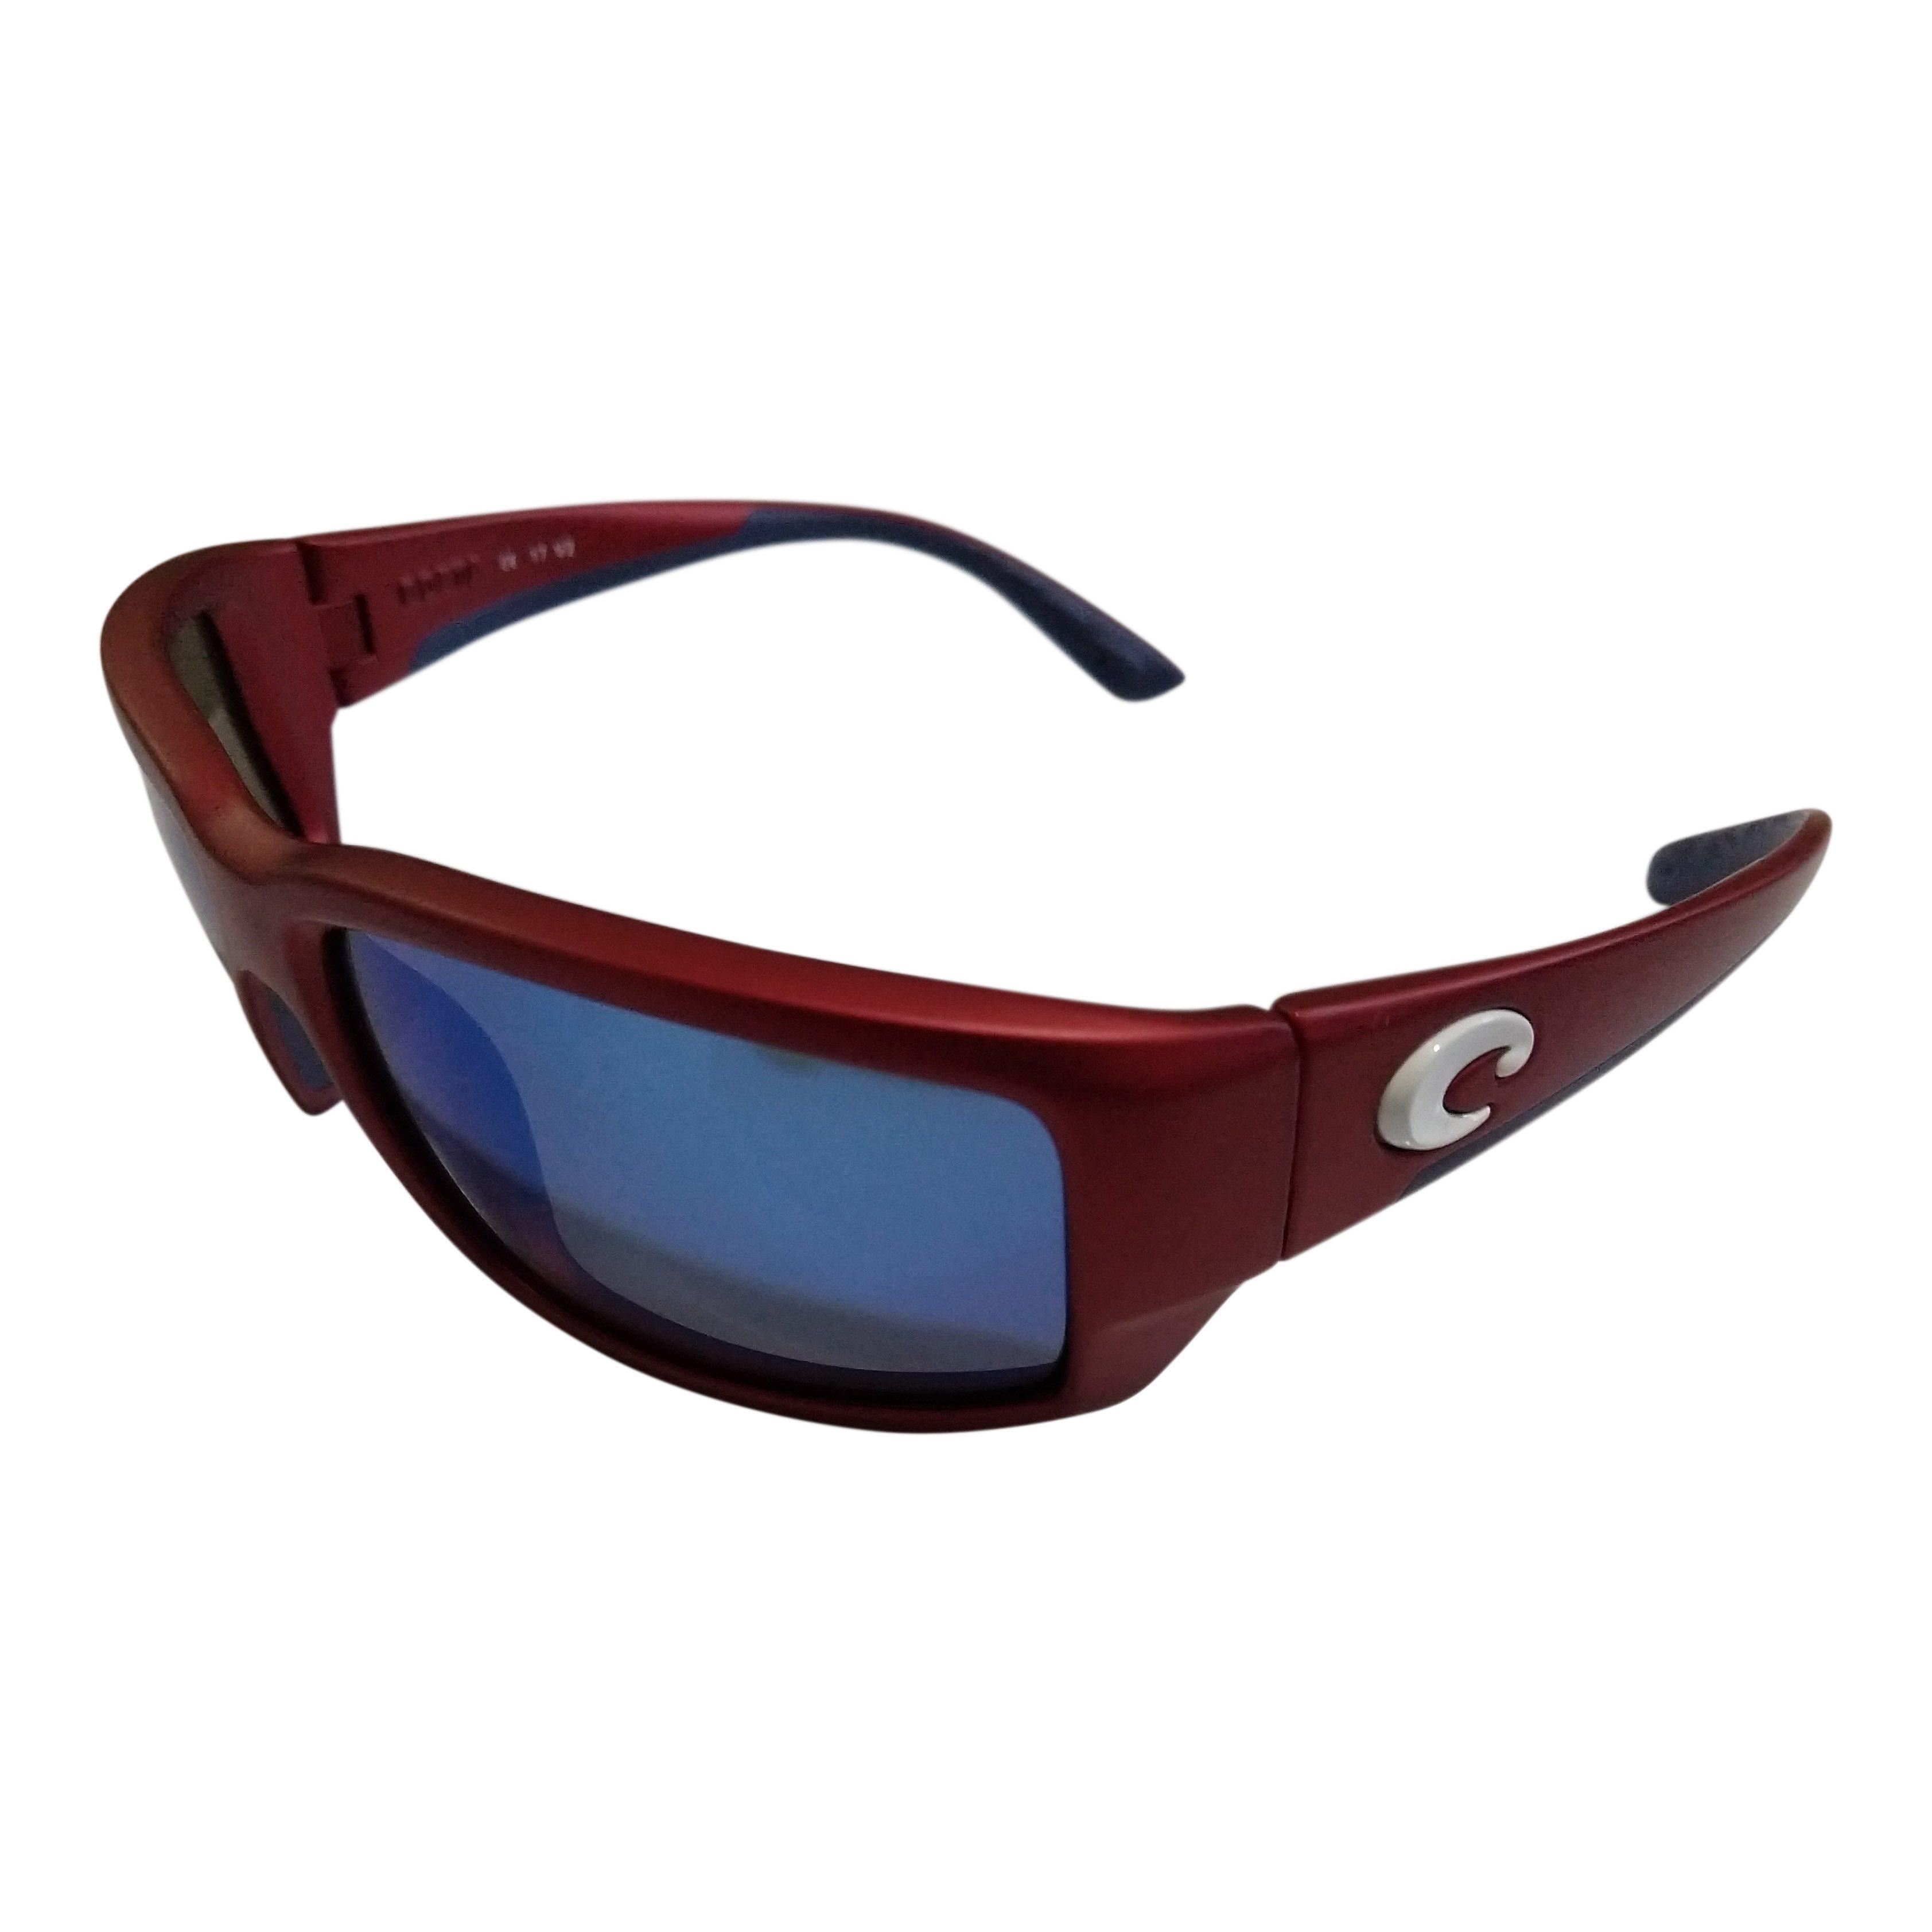 47dc536b1ed Costa Del Mar Fantail Sunglasses - USA Red Frame - POLARIZED Blue Mirror  400G